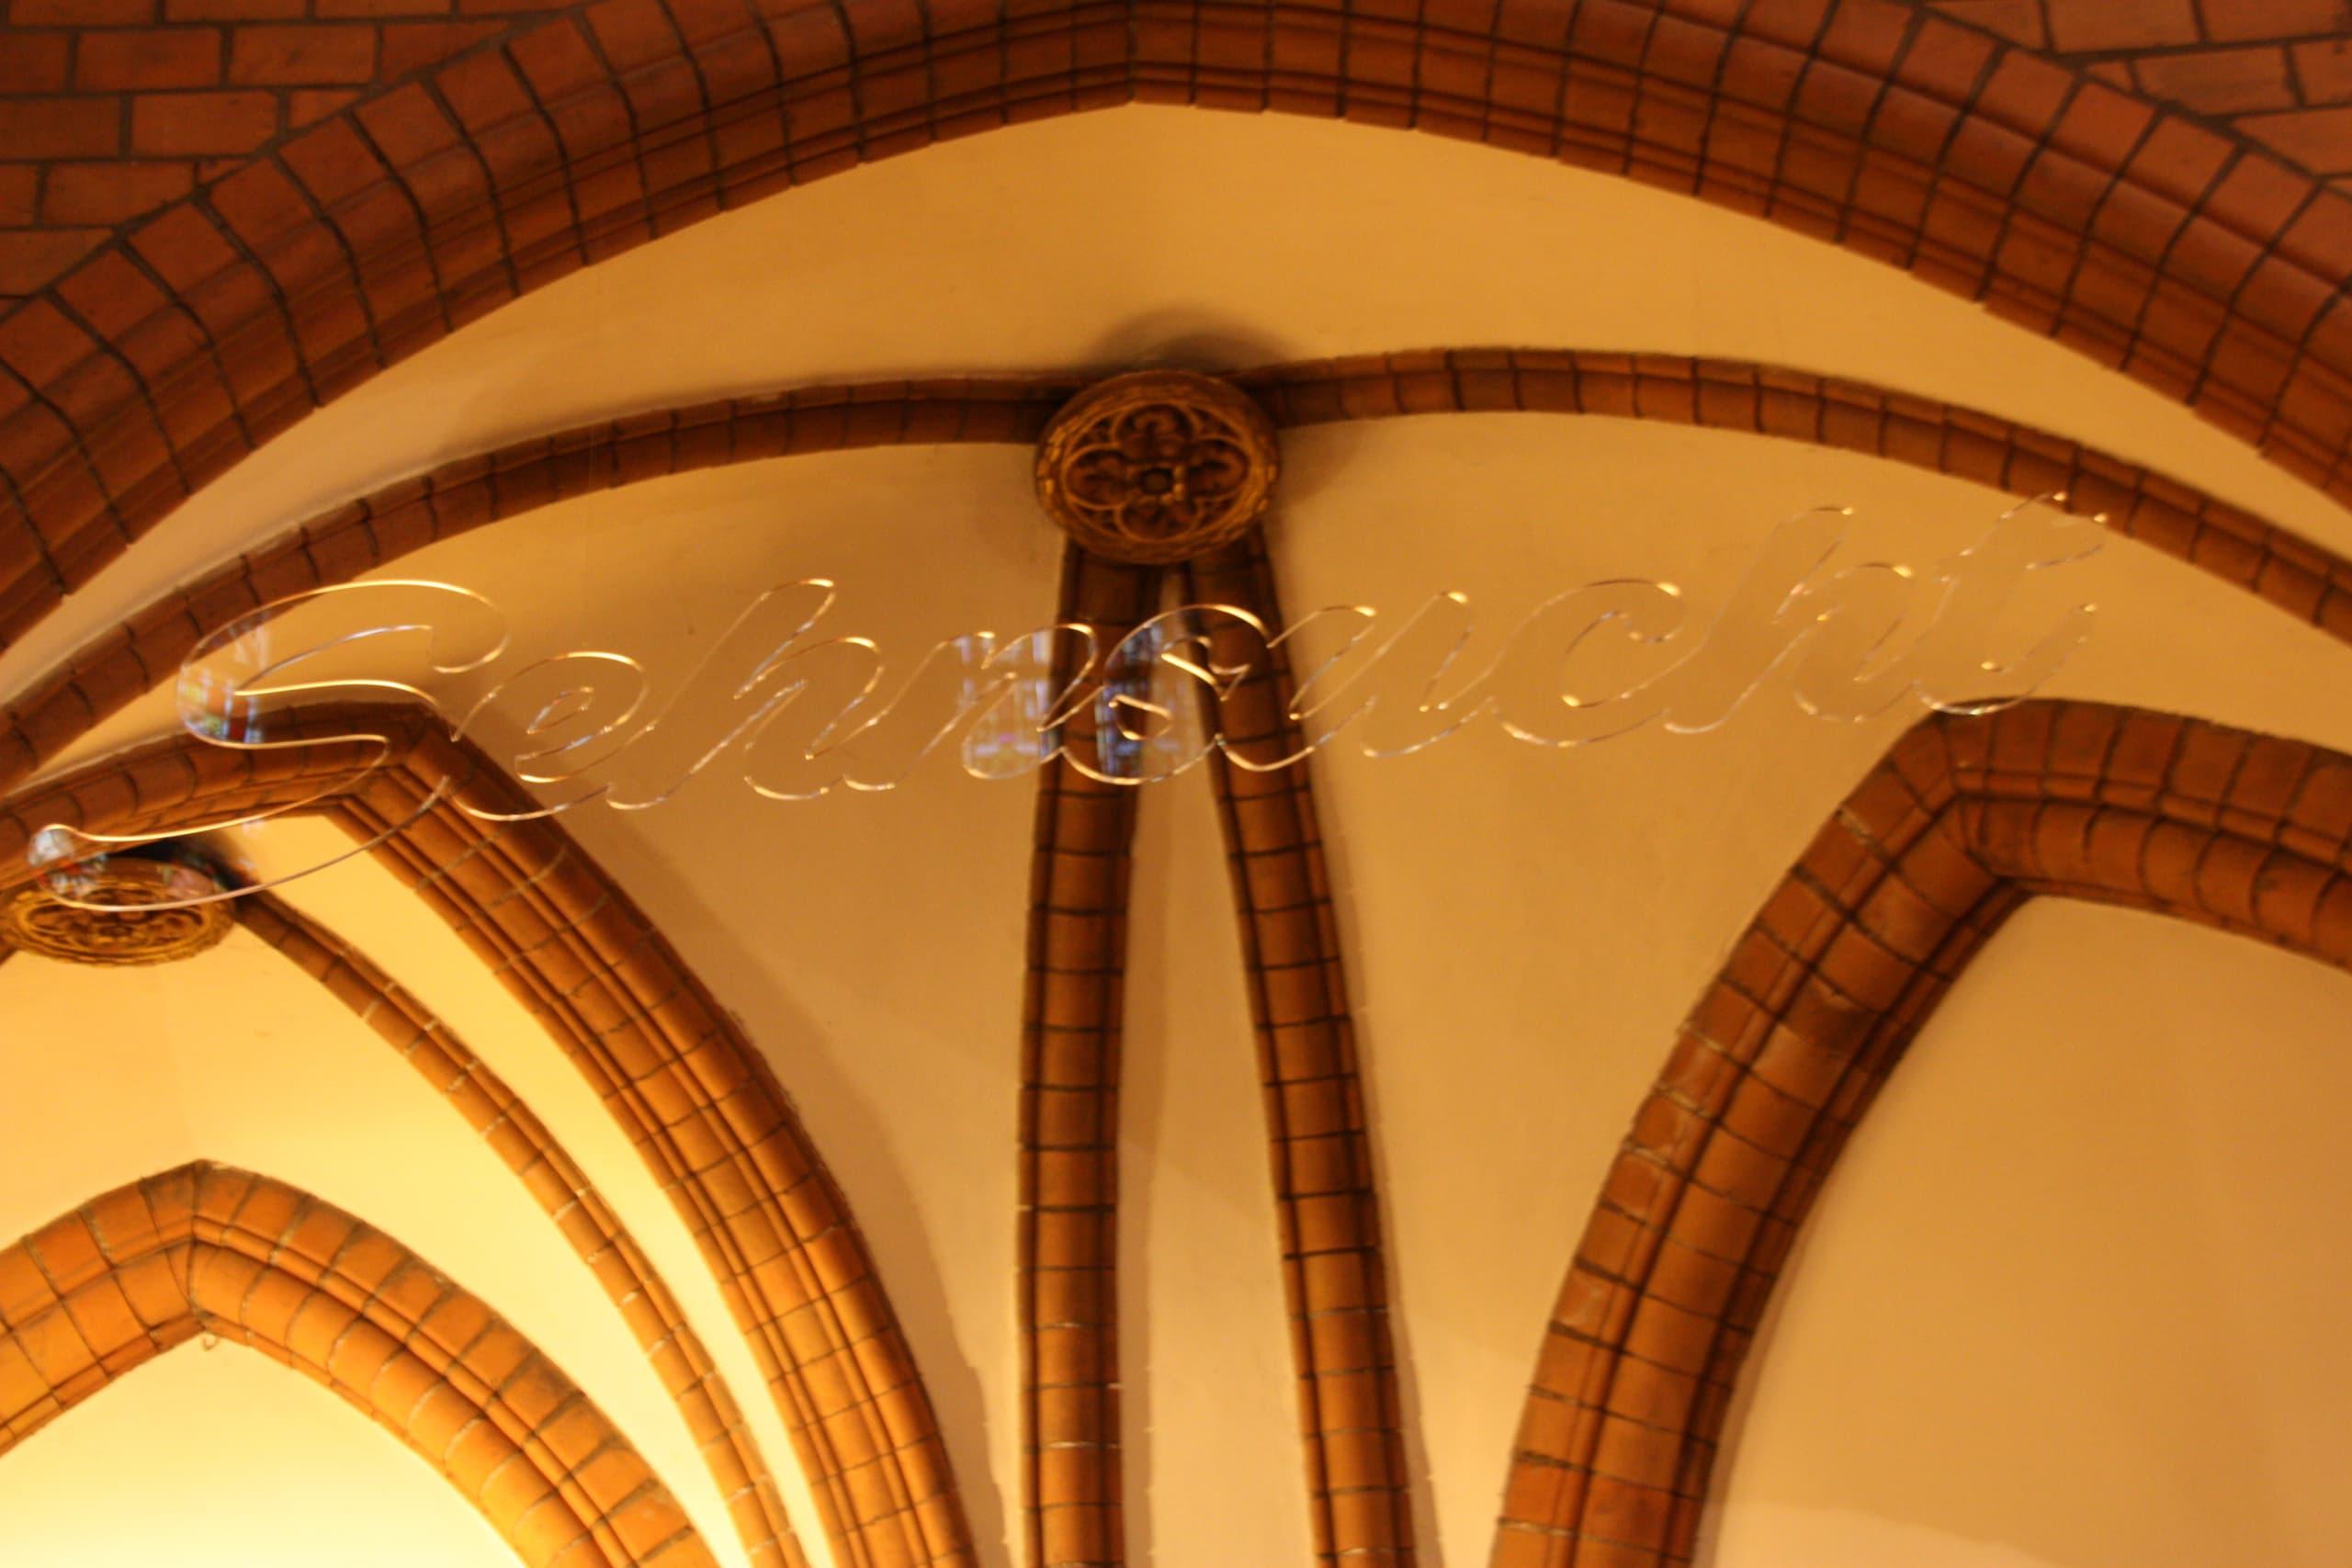 Kirche St. Johannis Harvestehude, Hamburg – Ausstellungen